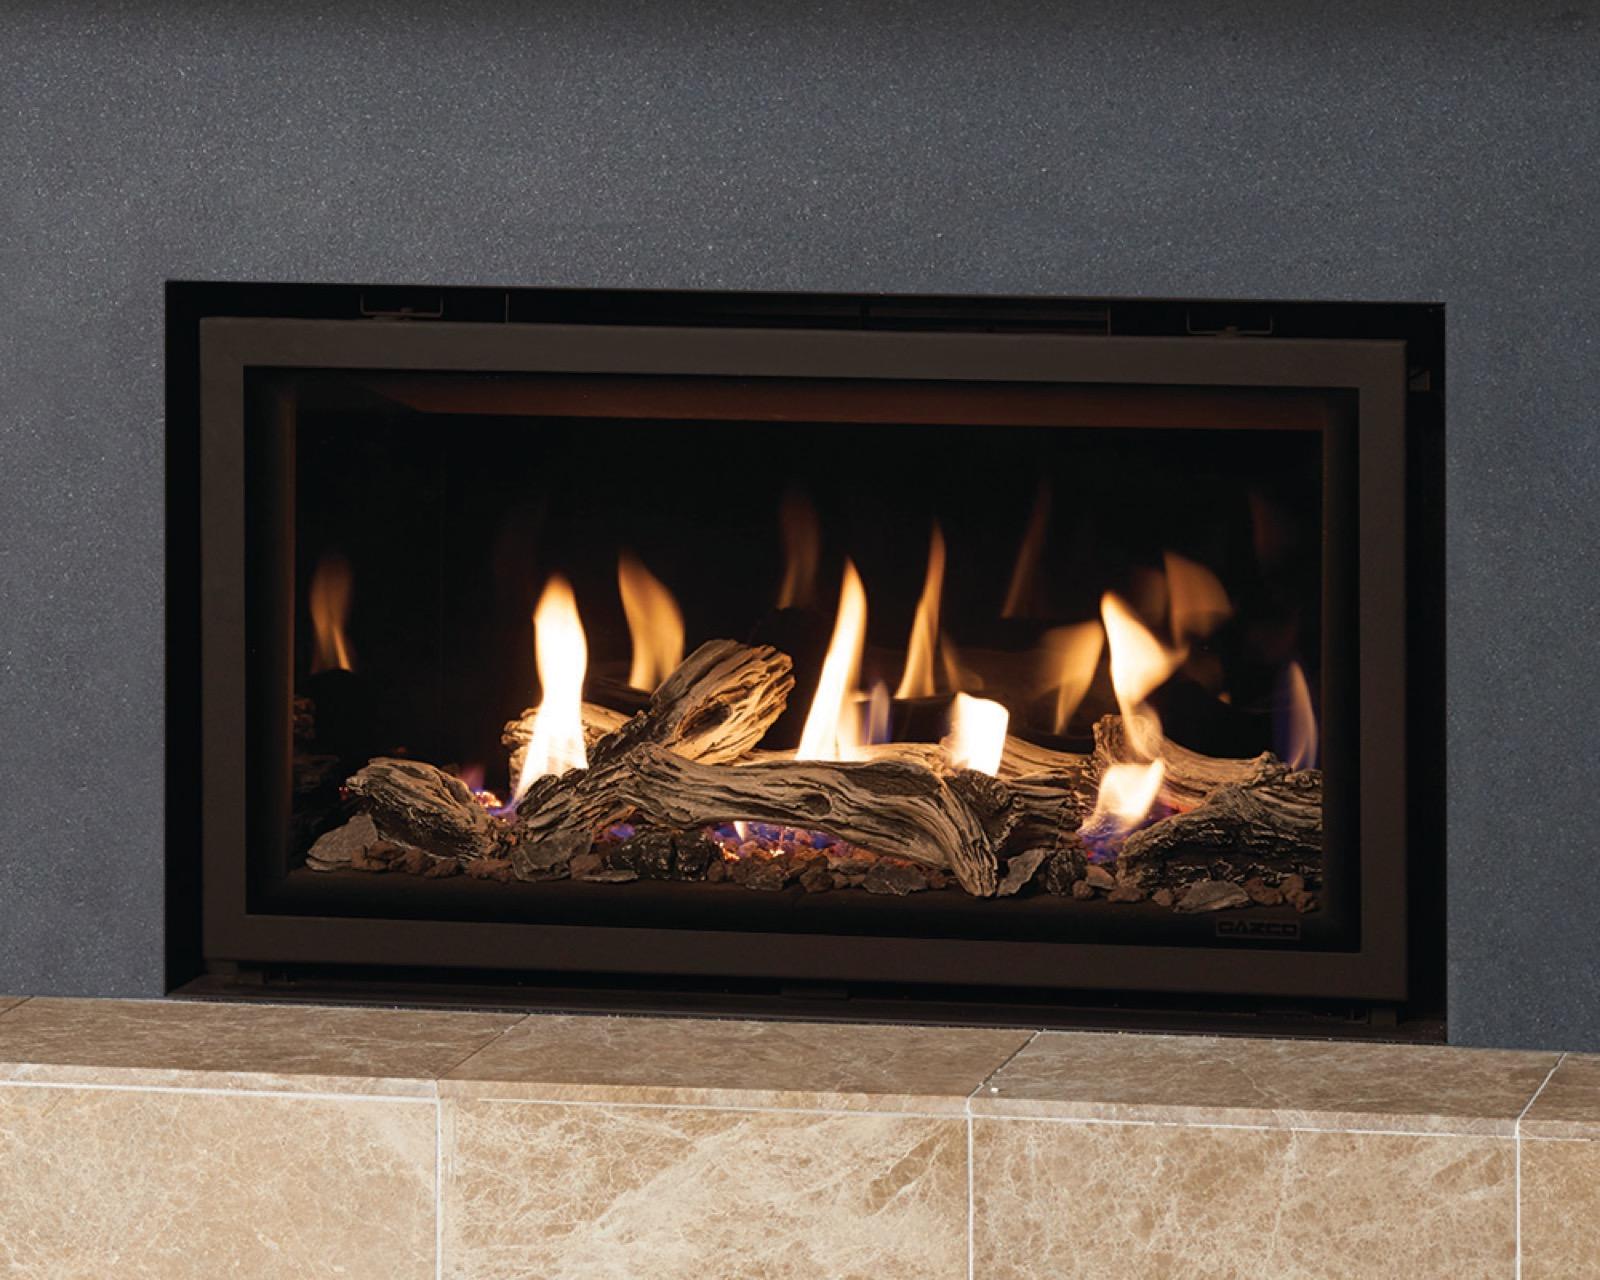 Gazco Studio 1 Glass Fronted Gas Fire, Conventional Flue, Natural Gas